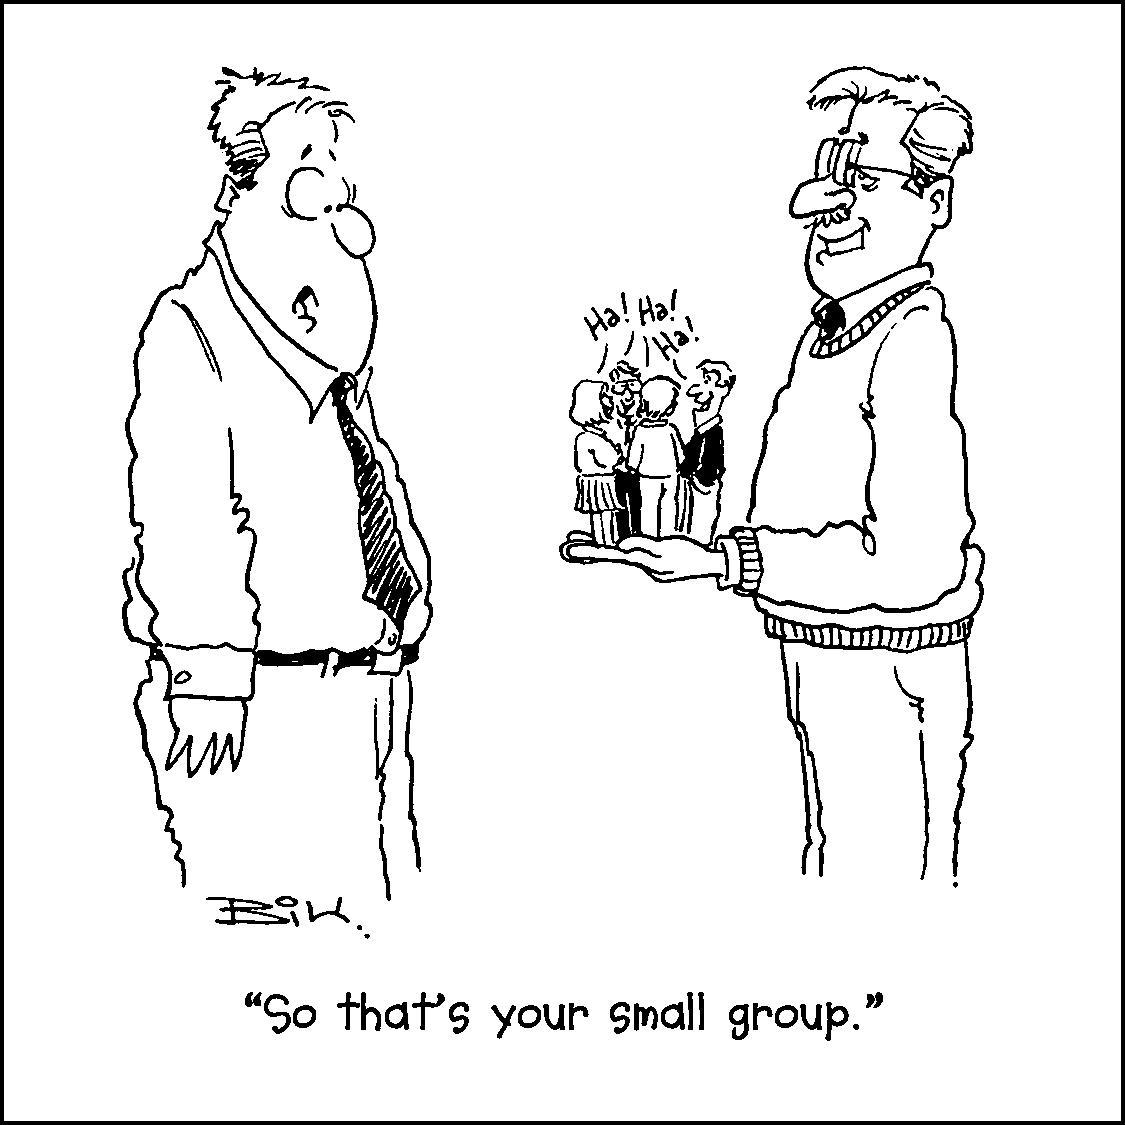 1125x1125 Small Group Cartoon First United Methodist Church, Los Alamos, Nm